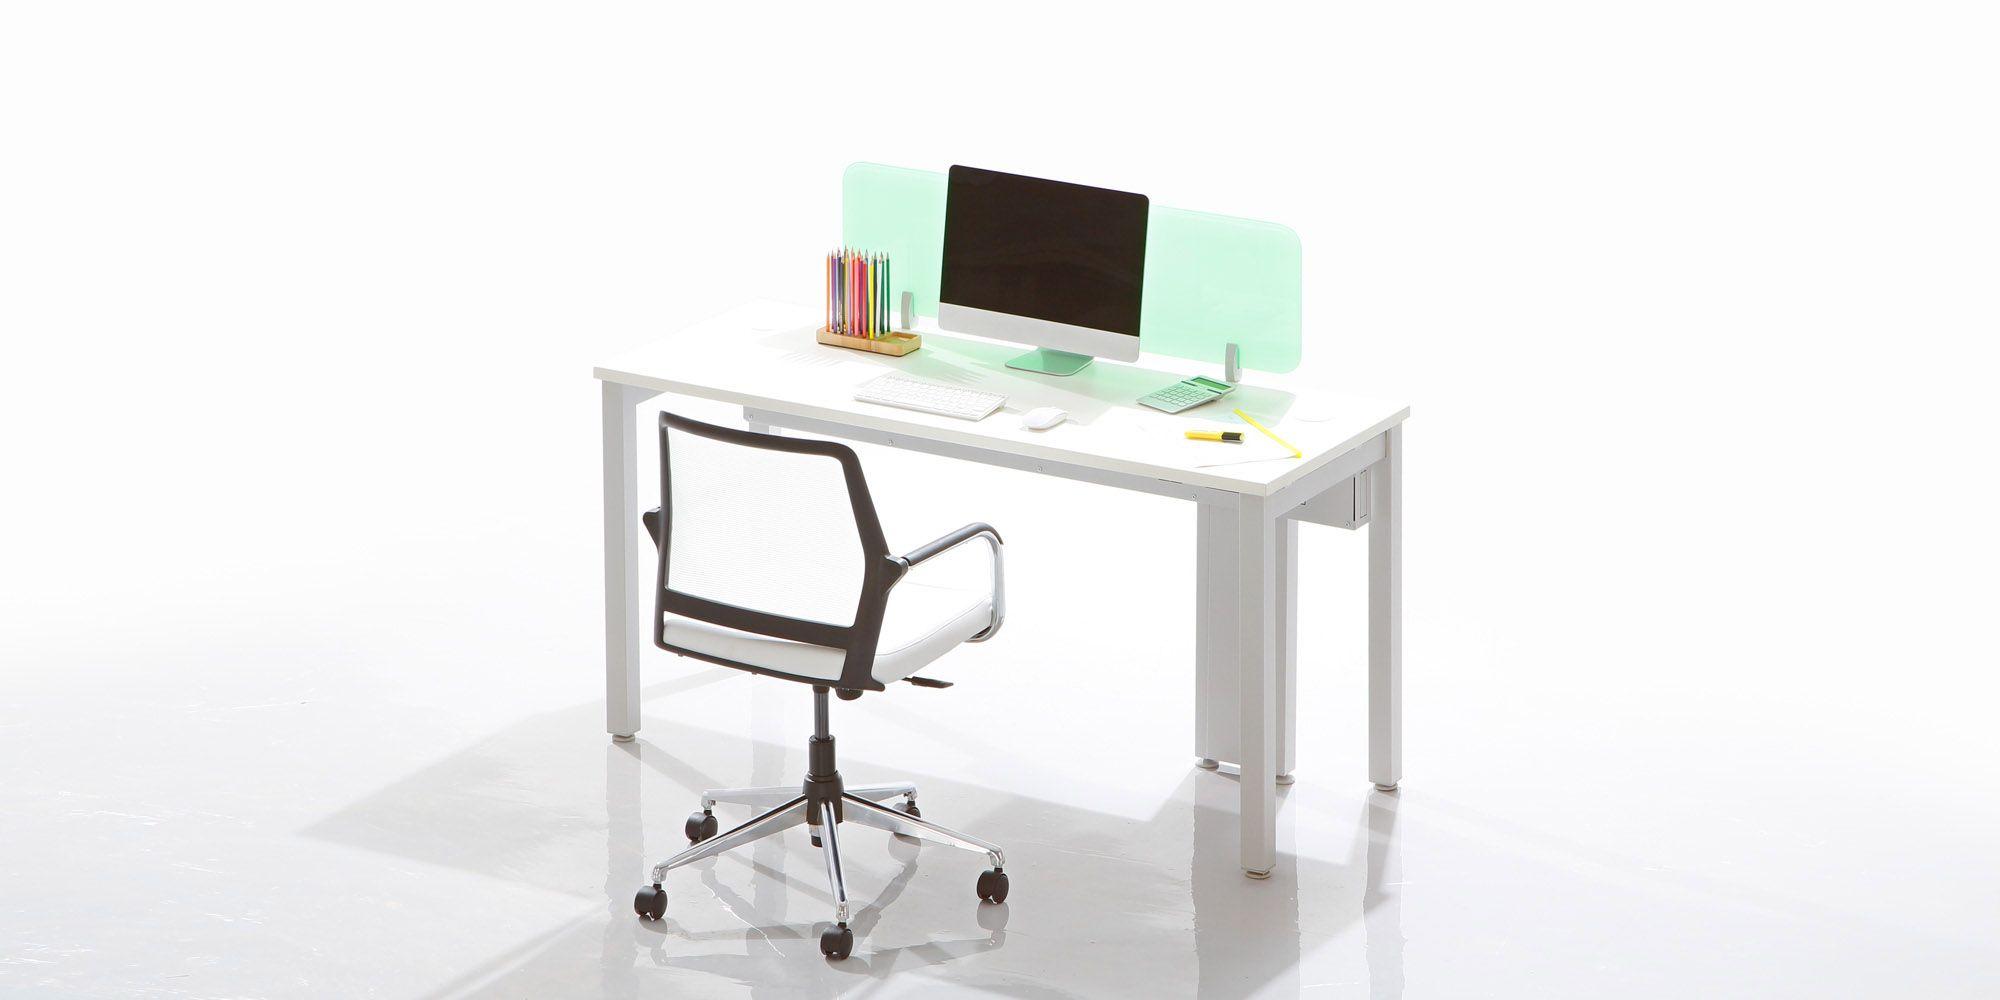 Buy Modular Office Workstations Furniture Online: Featherlite Furniture  Store